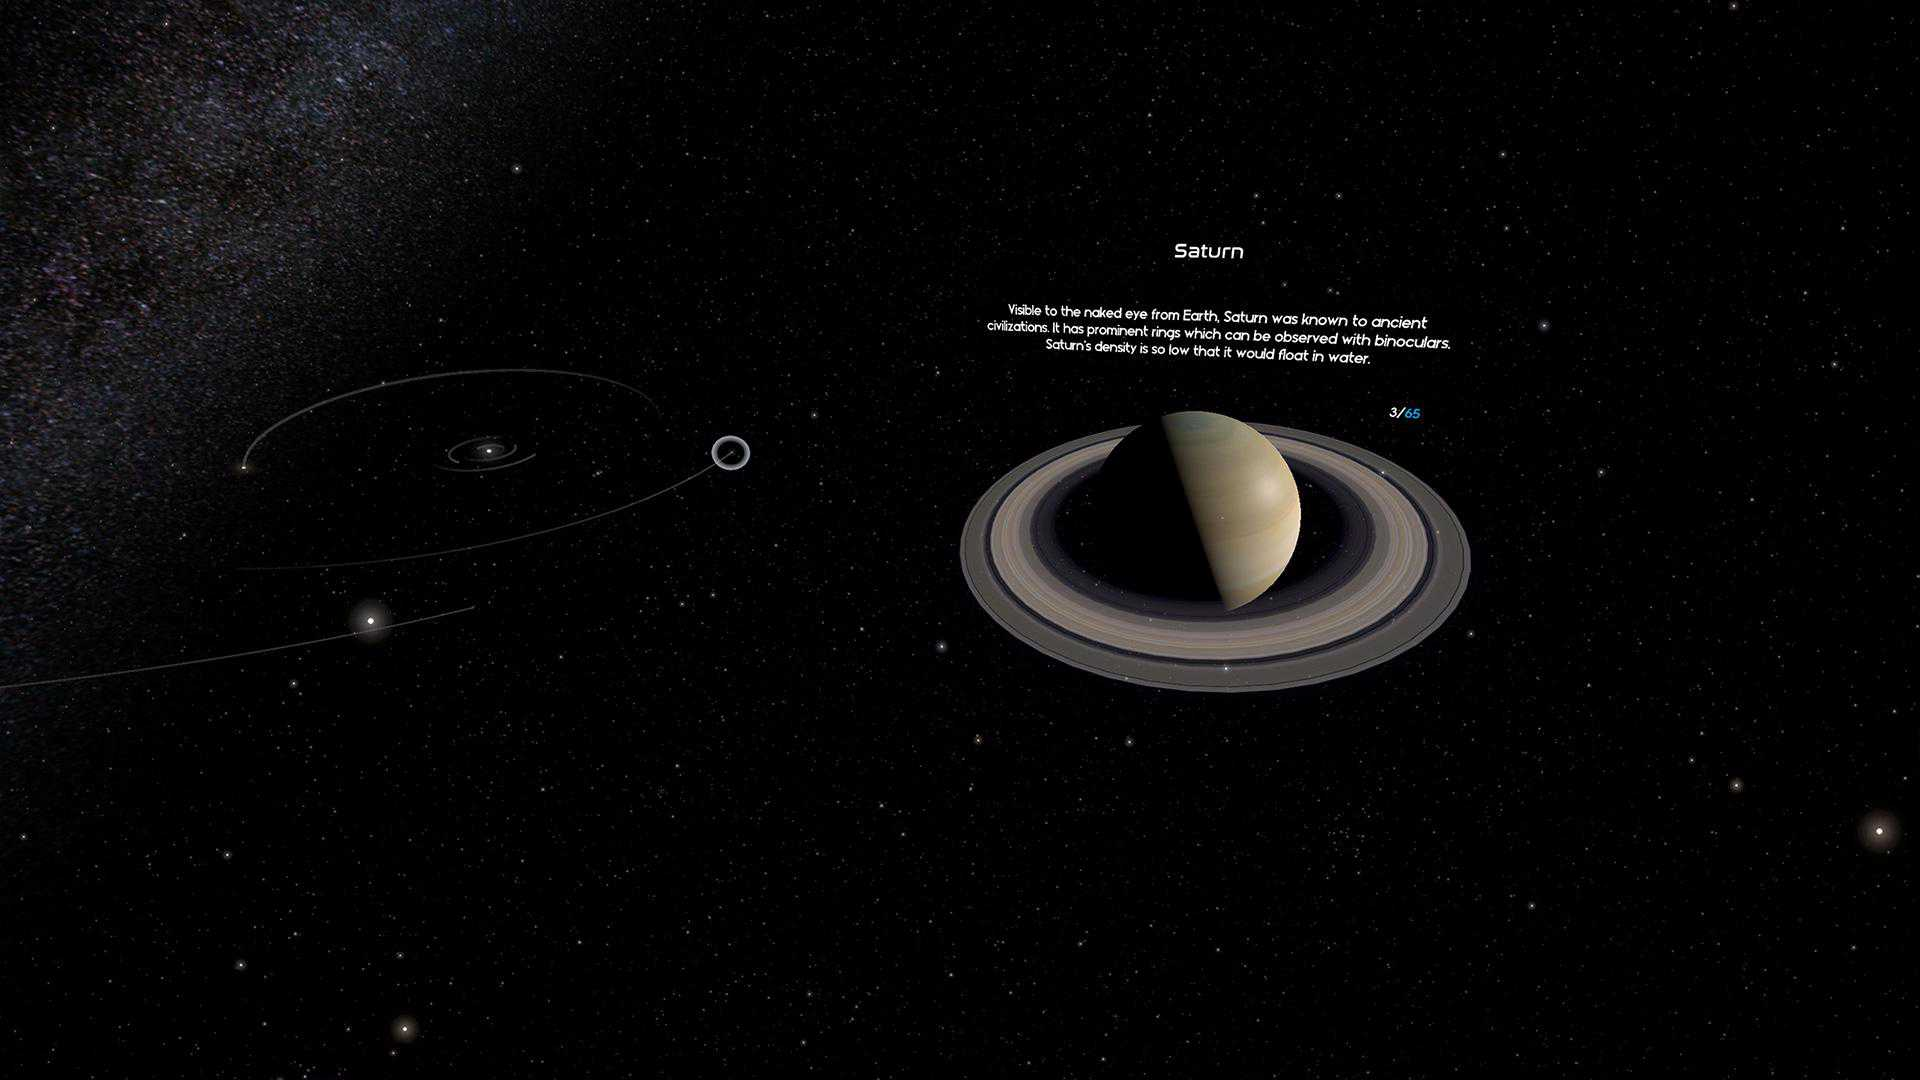 Orders_of_Magnitude_VR-Test-Saturn